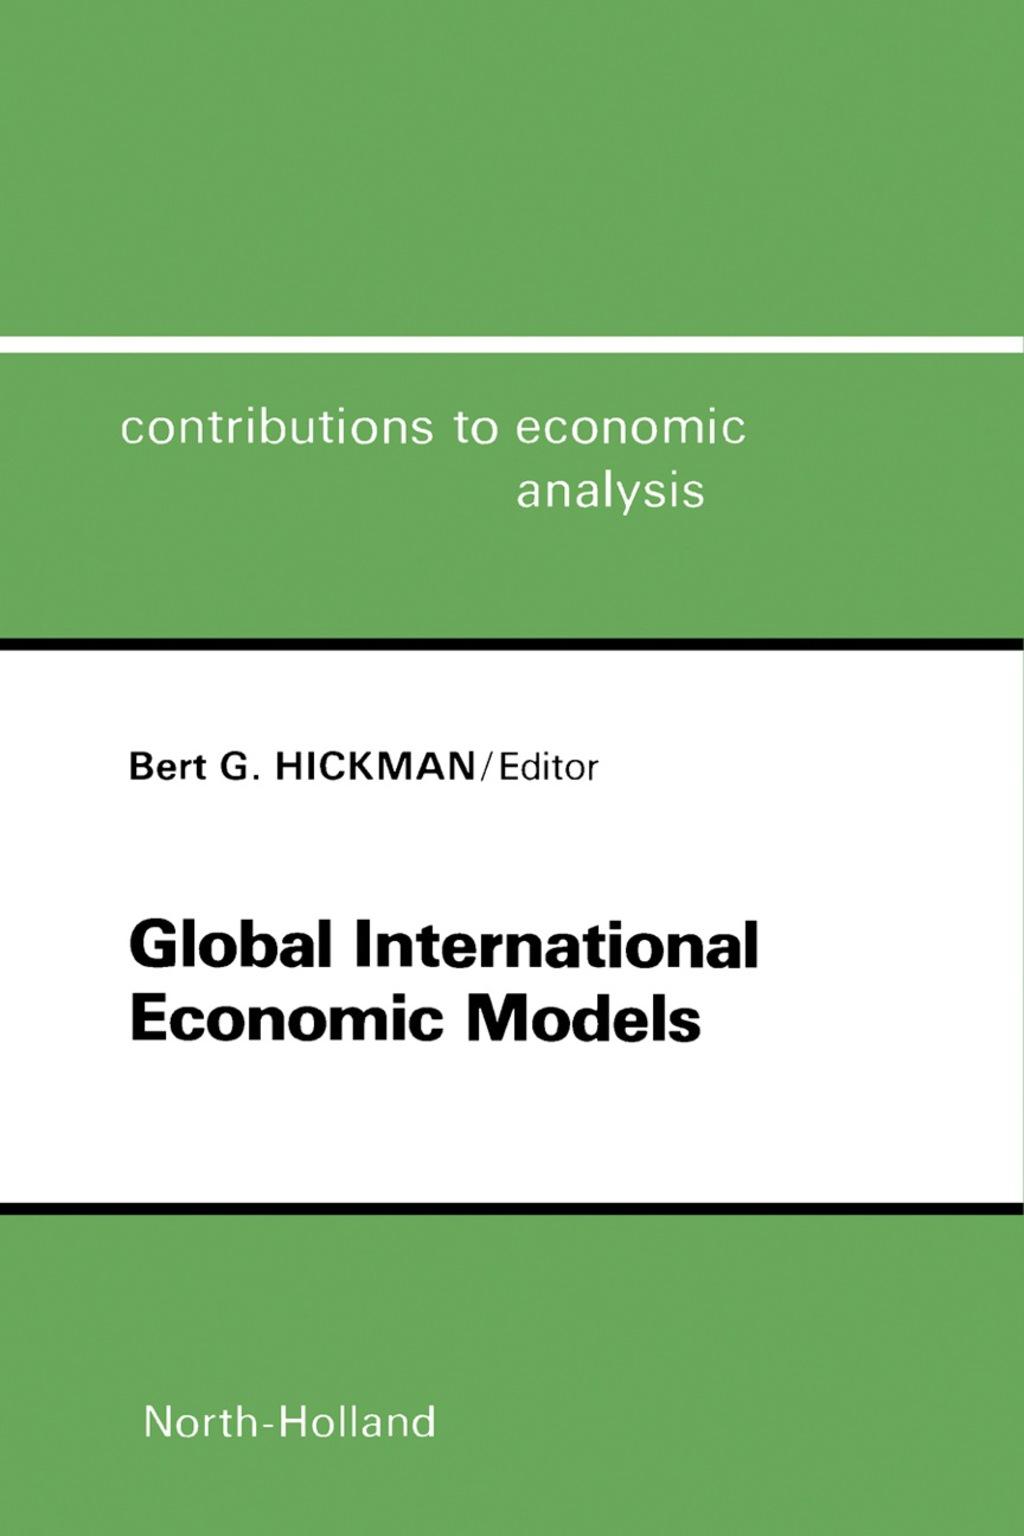 Global International Economic Models (eBook)